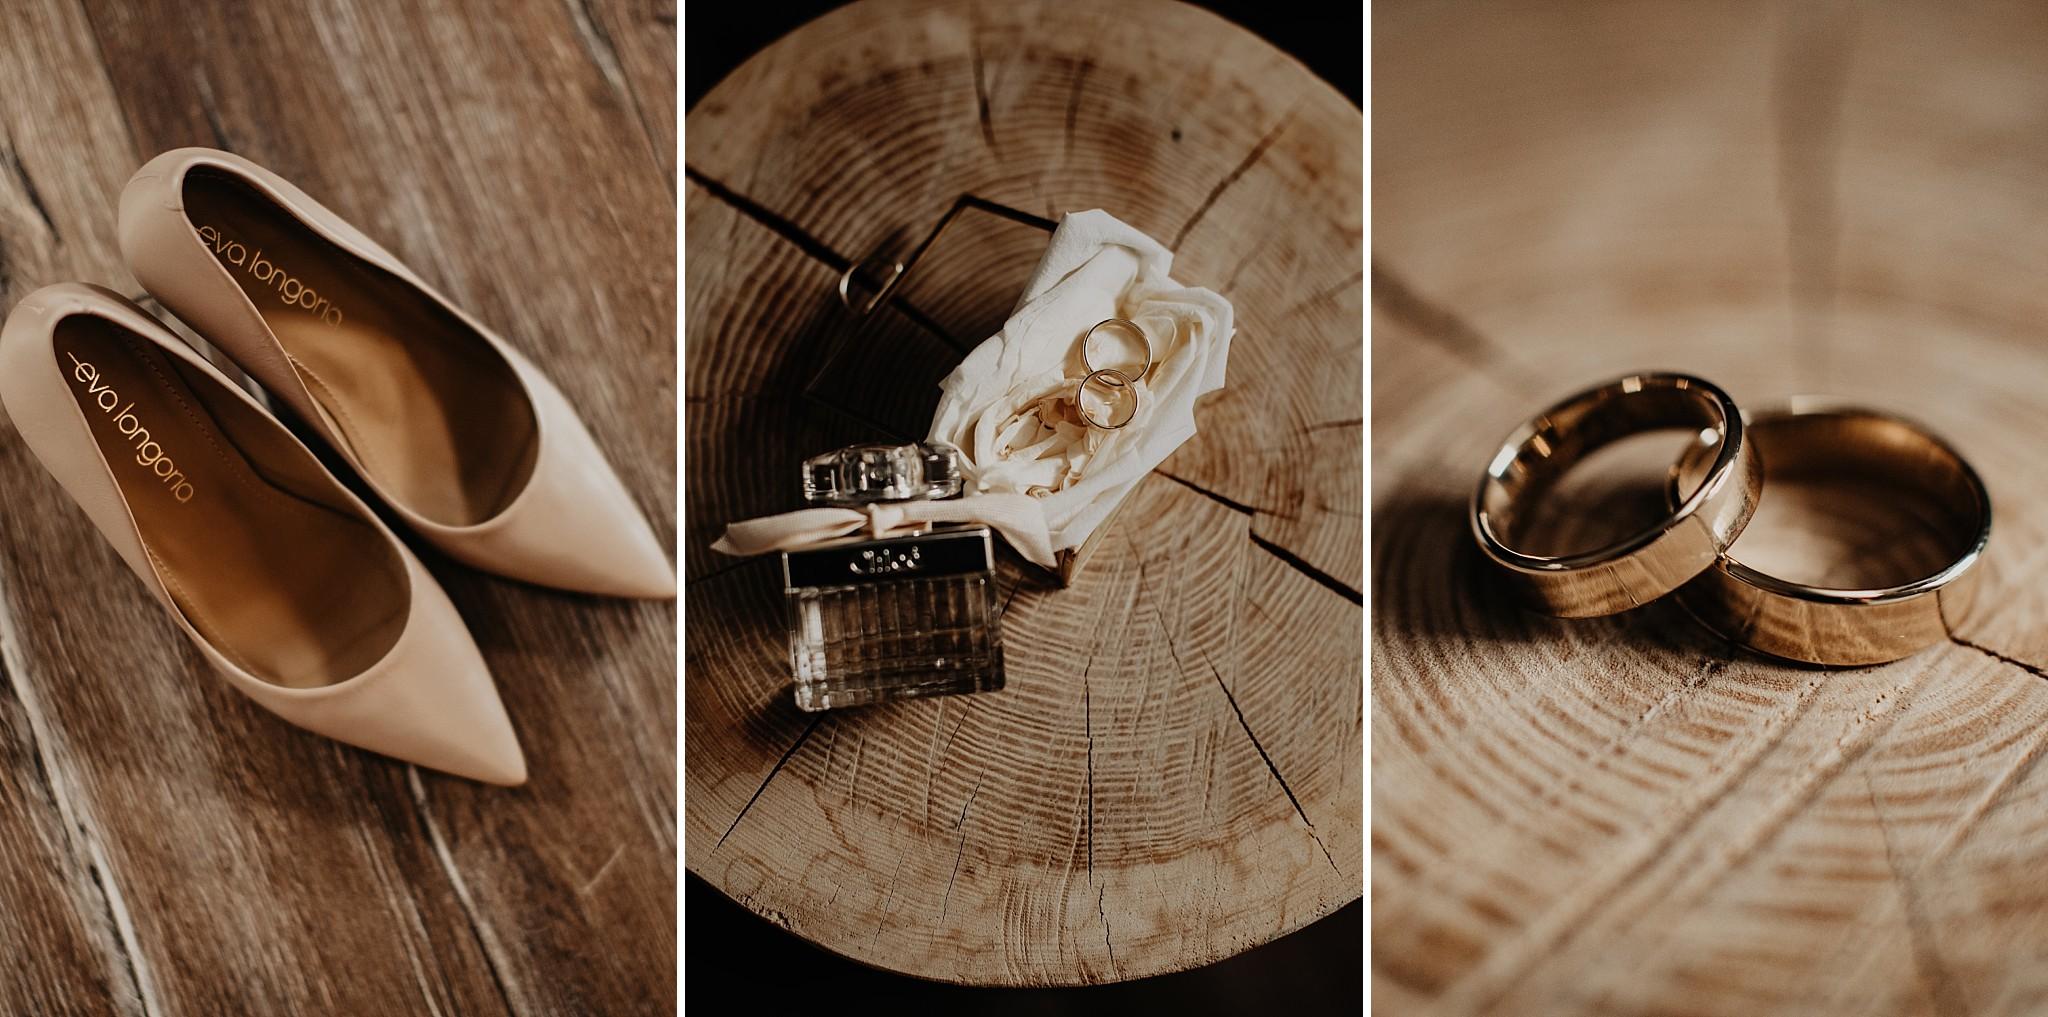 fotograf poznan wesele dobra truskawka piekne wesele pod poznaniem wesele w dobrej truskawce piekna para mloda slub marzen slub koronawirus slub listopad wesele koronawirus 013